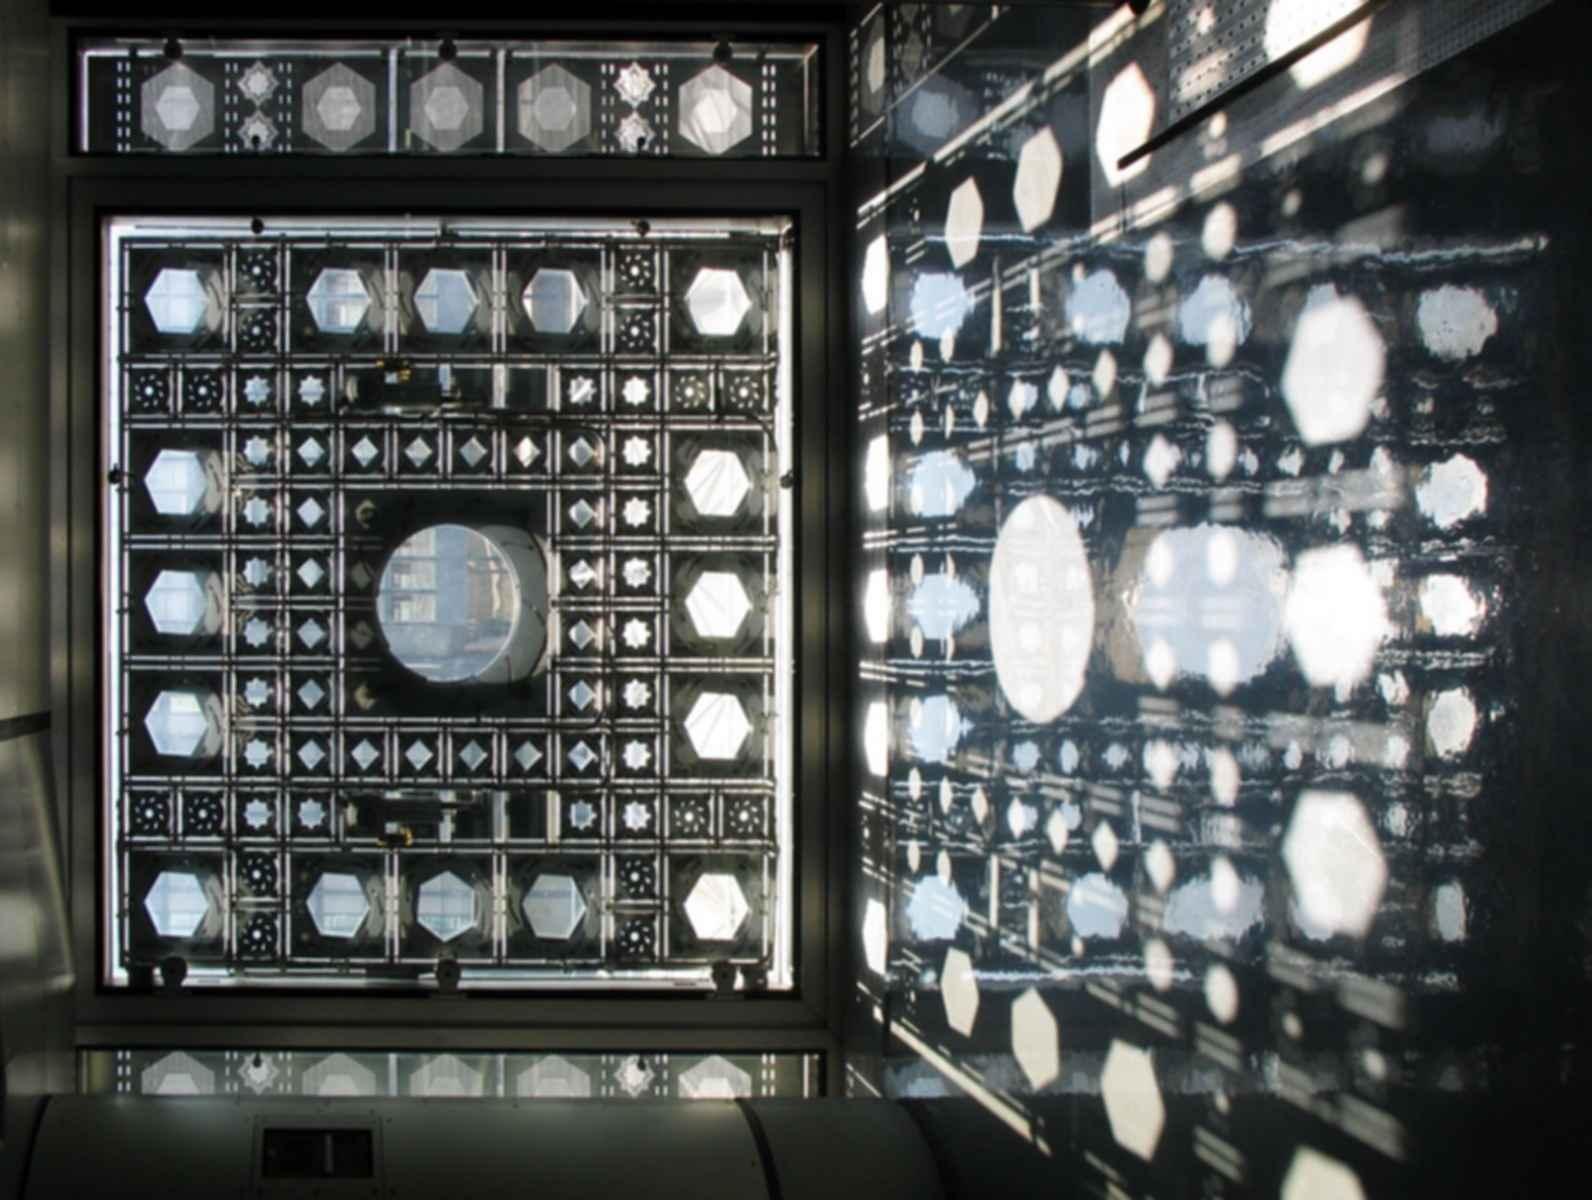 Arab World Institute - Interior Glass